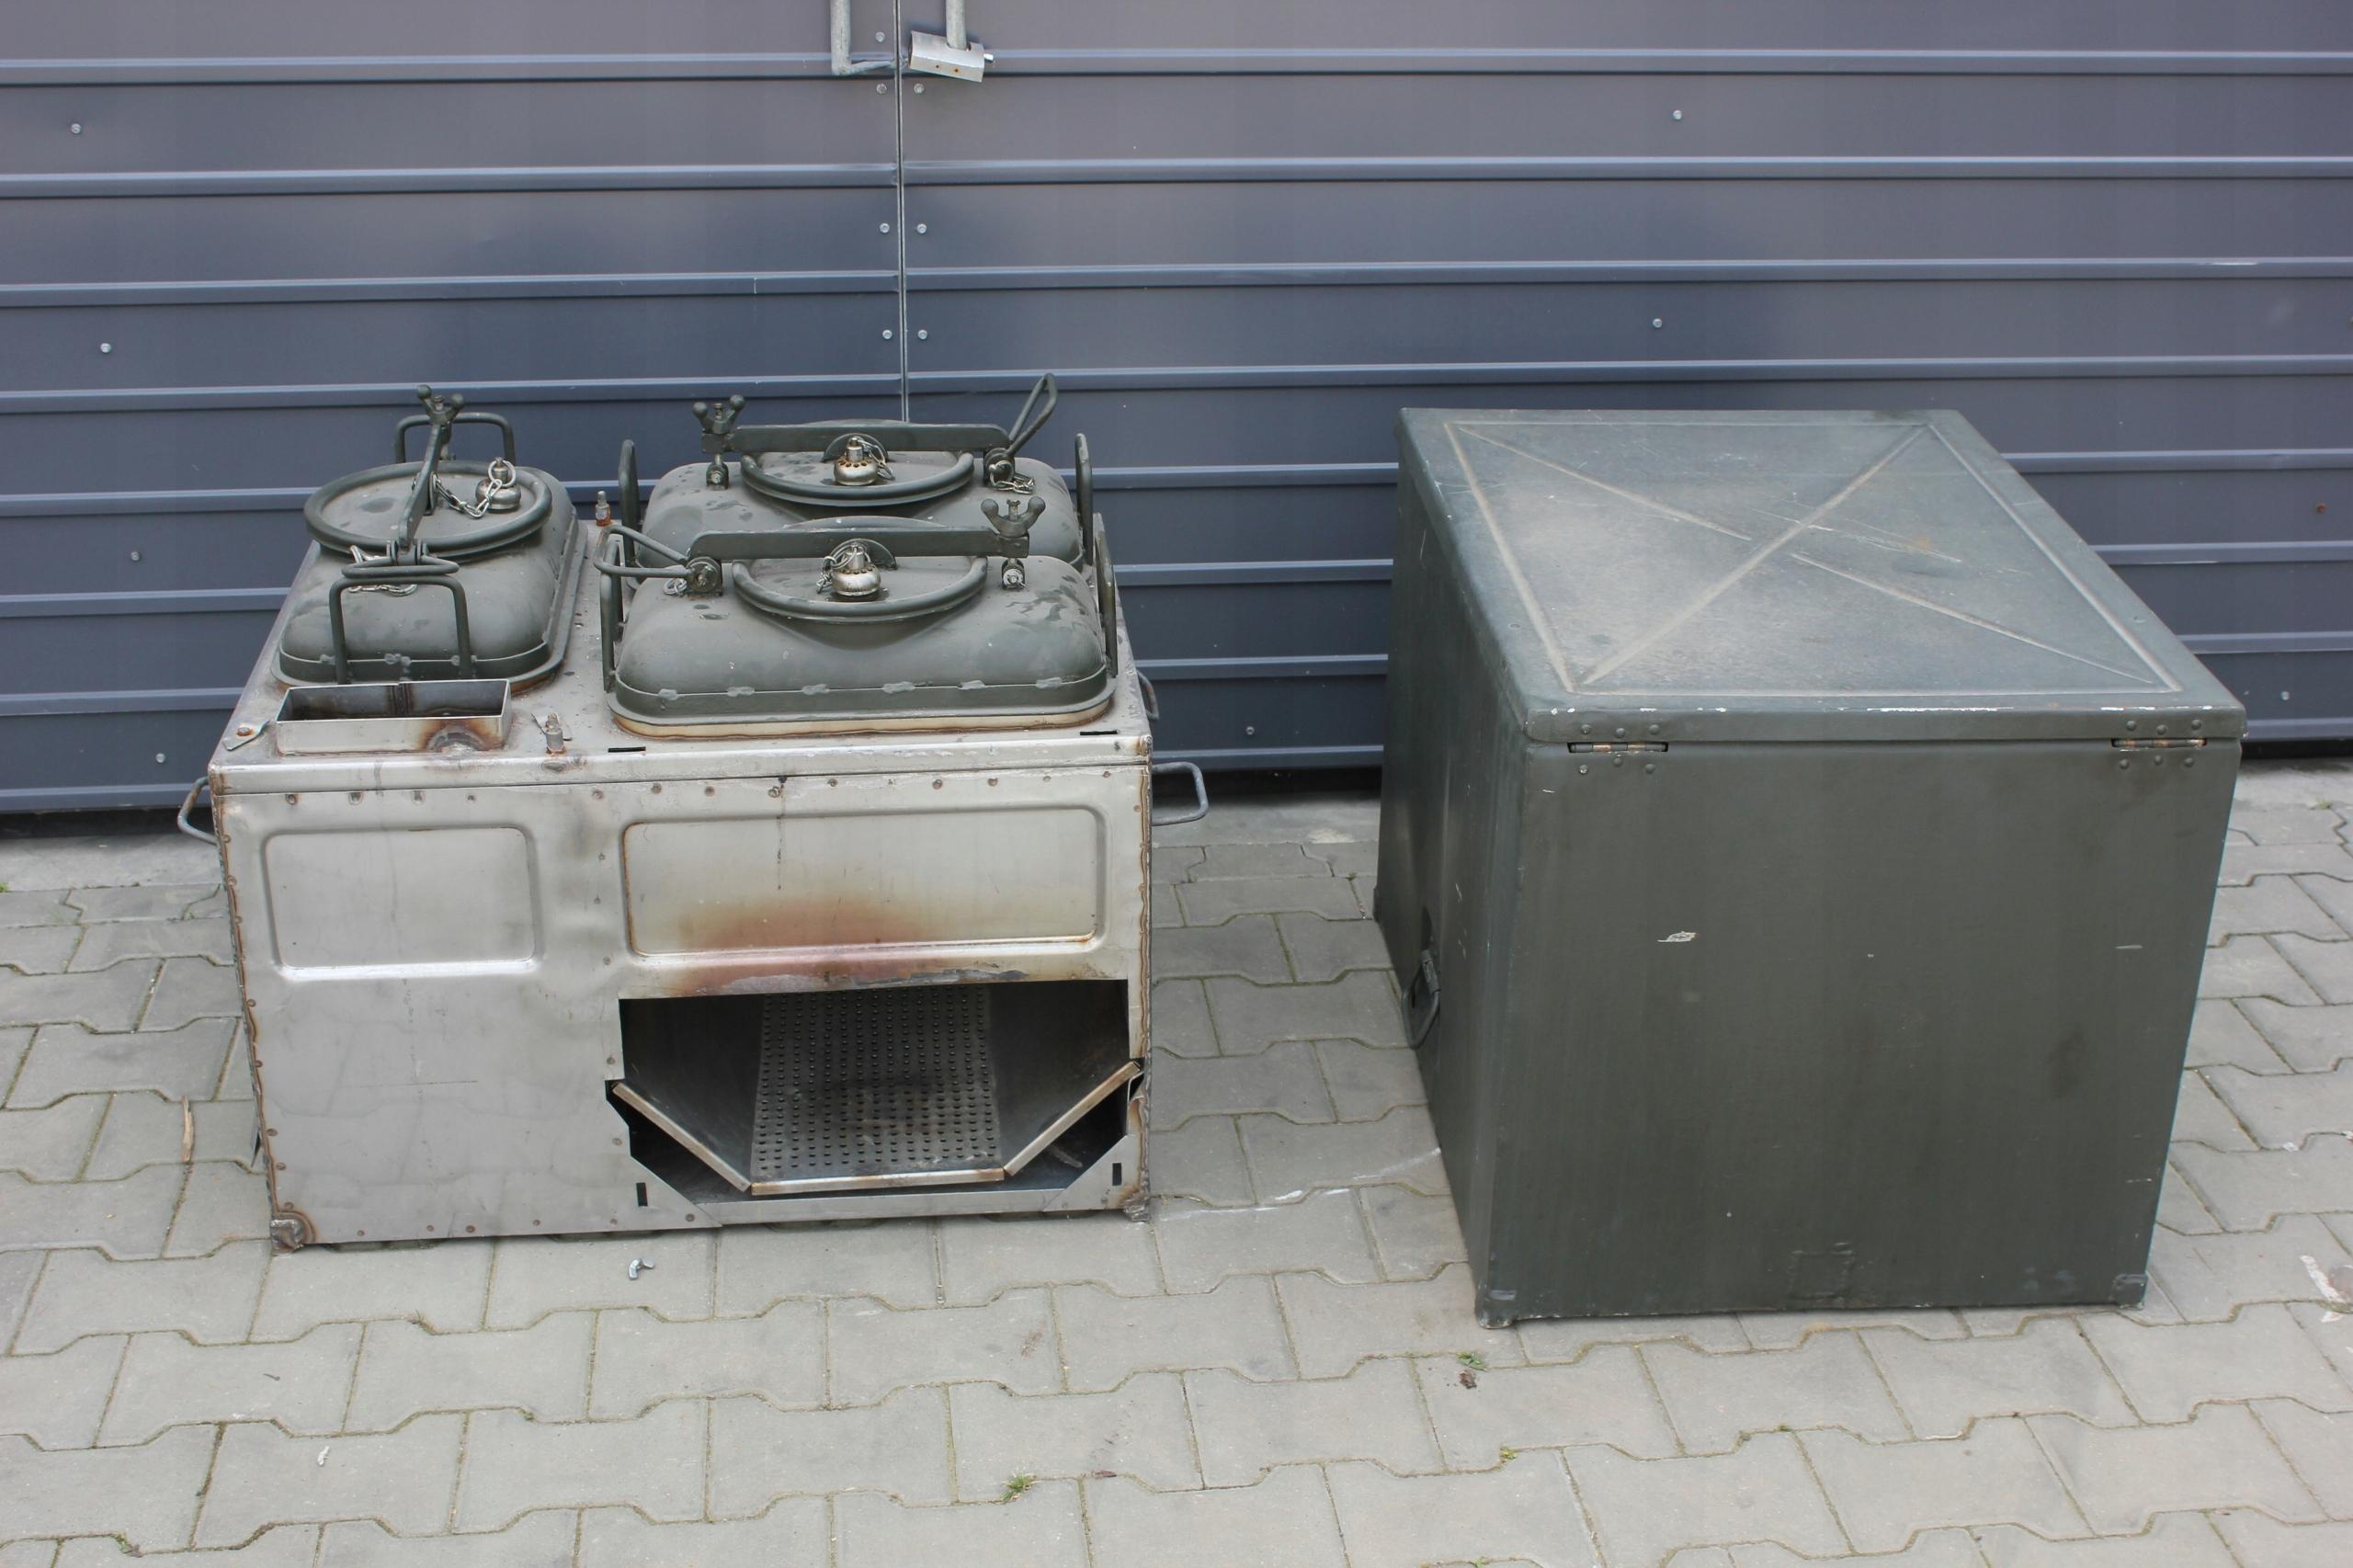 Kuchnia Polowa Kp 75 Nowa Oryginal Wp Garkuchnia 7560206581